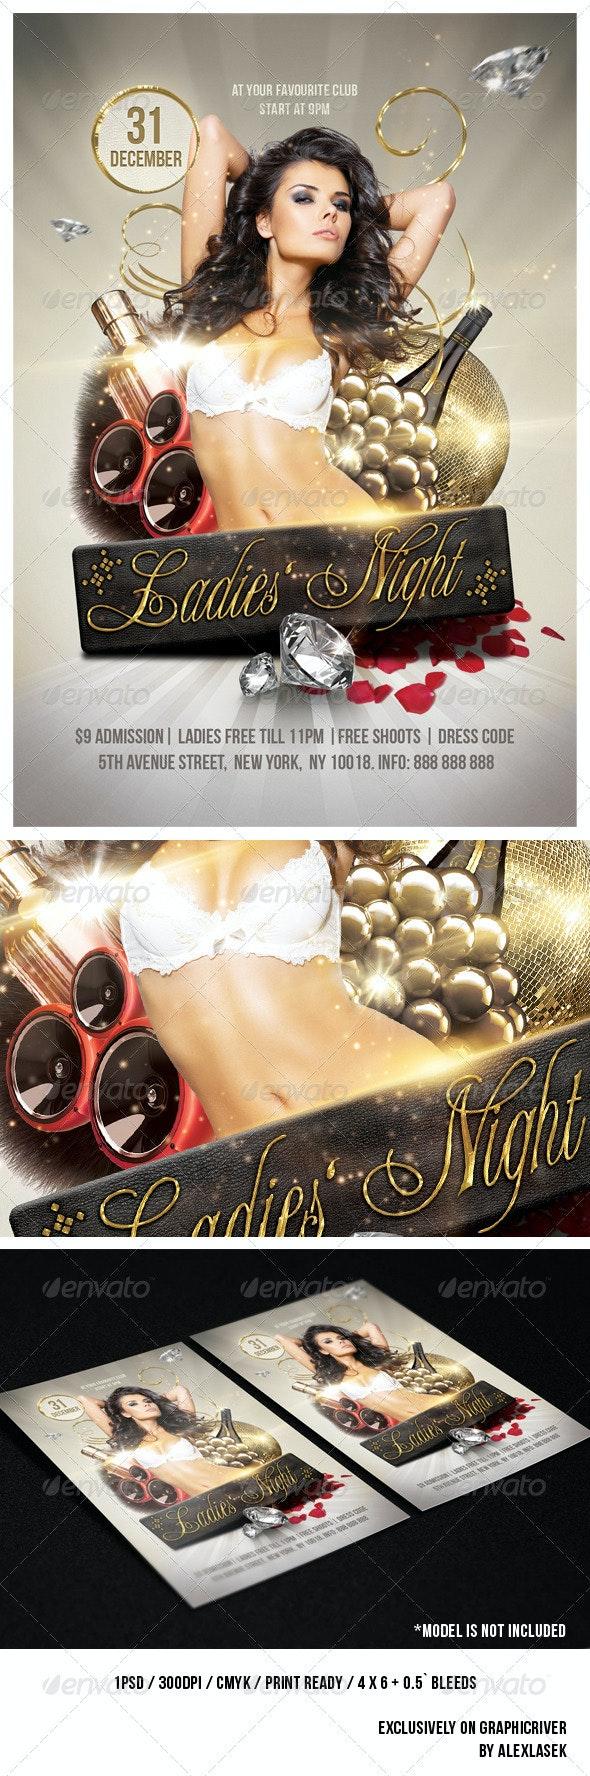 Golden Ladies Party Flyer 6 x 4 - Clubs & Parties Events